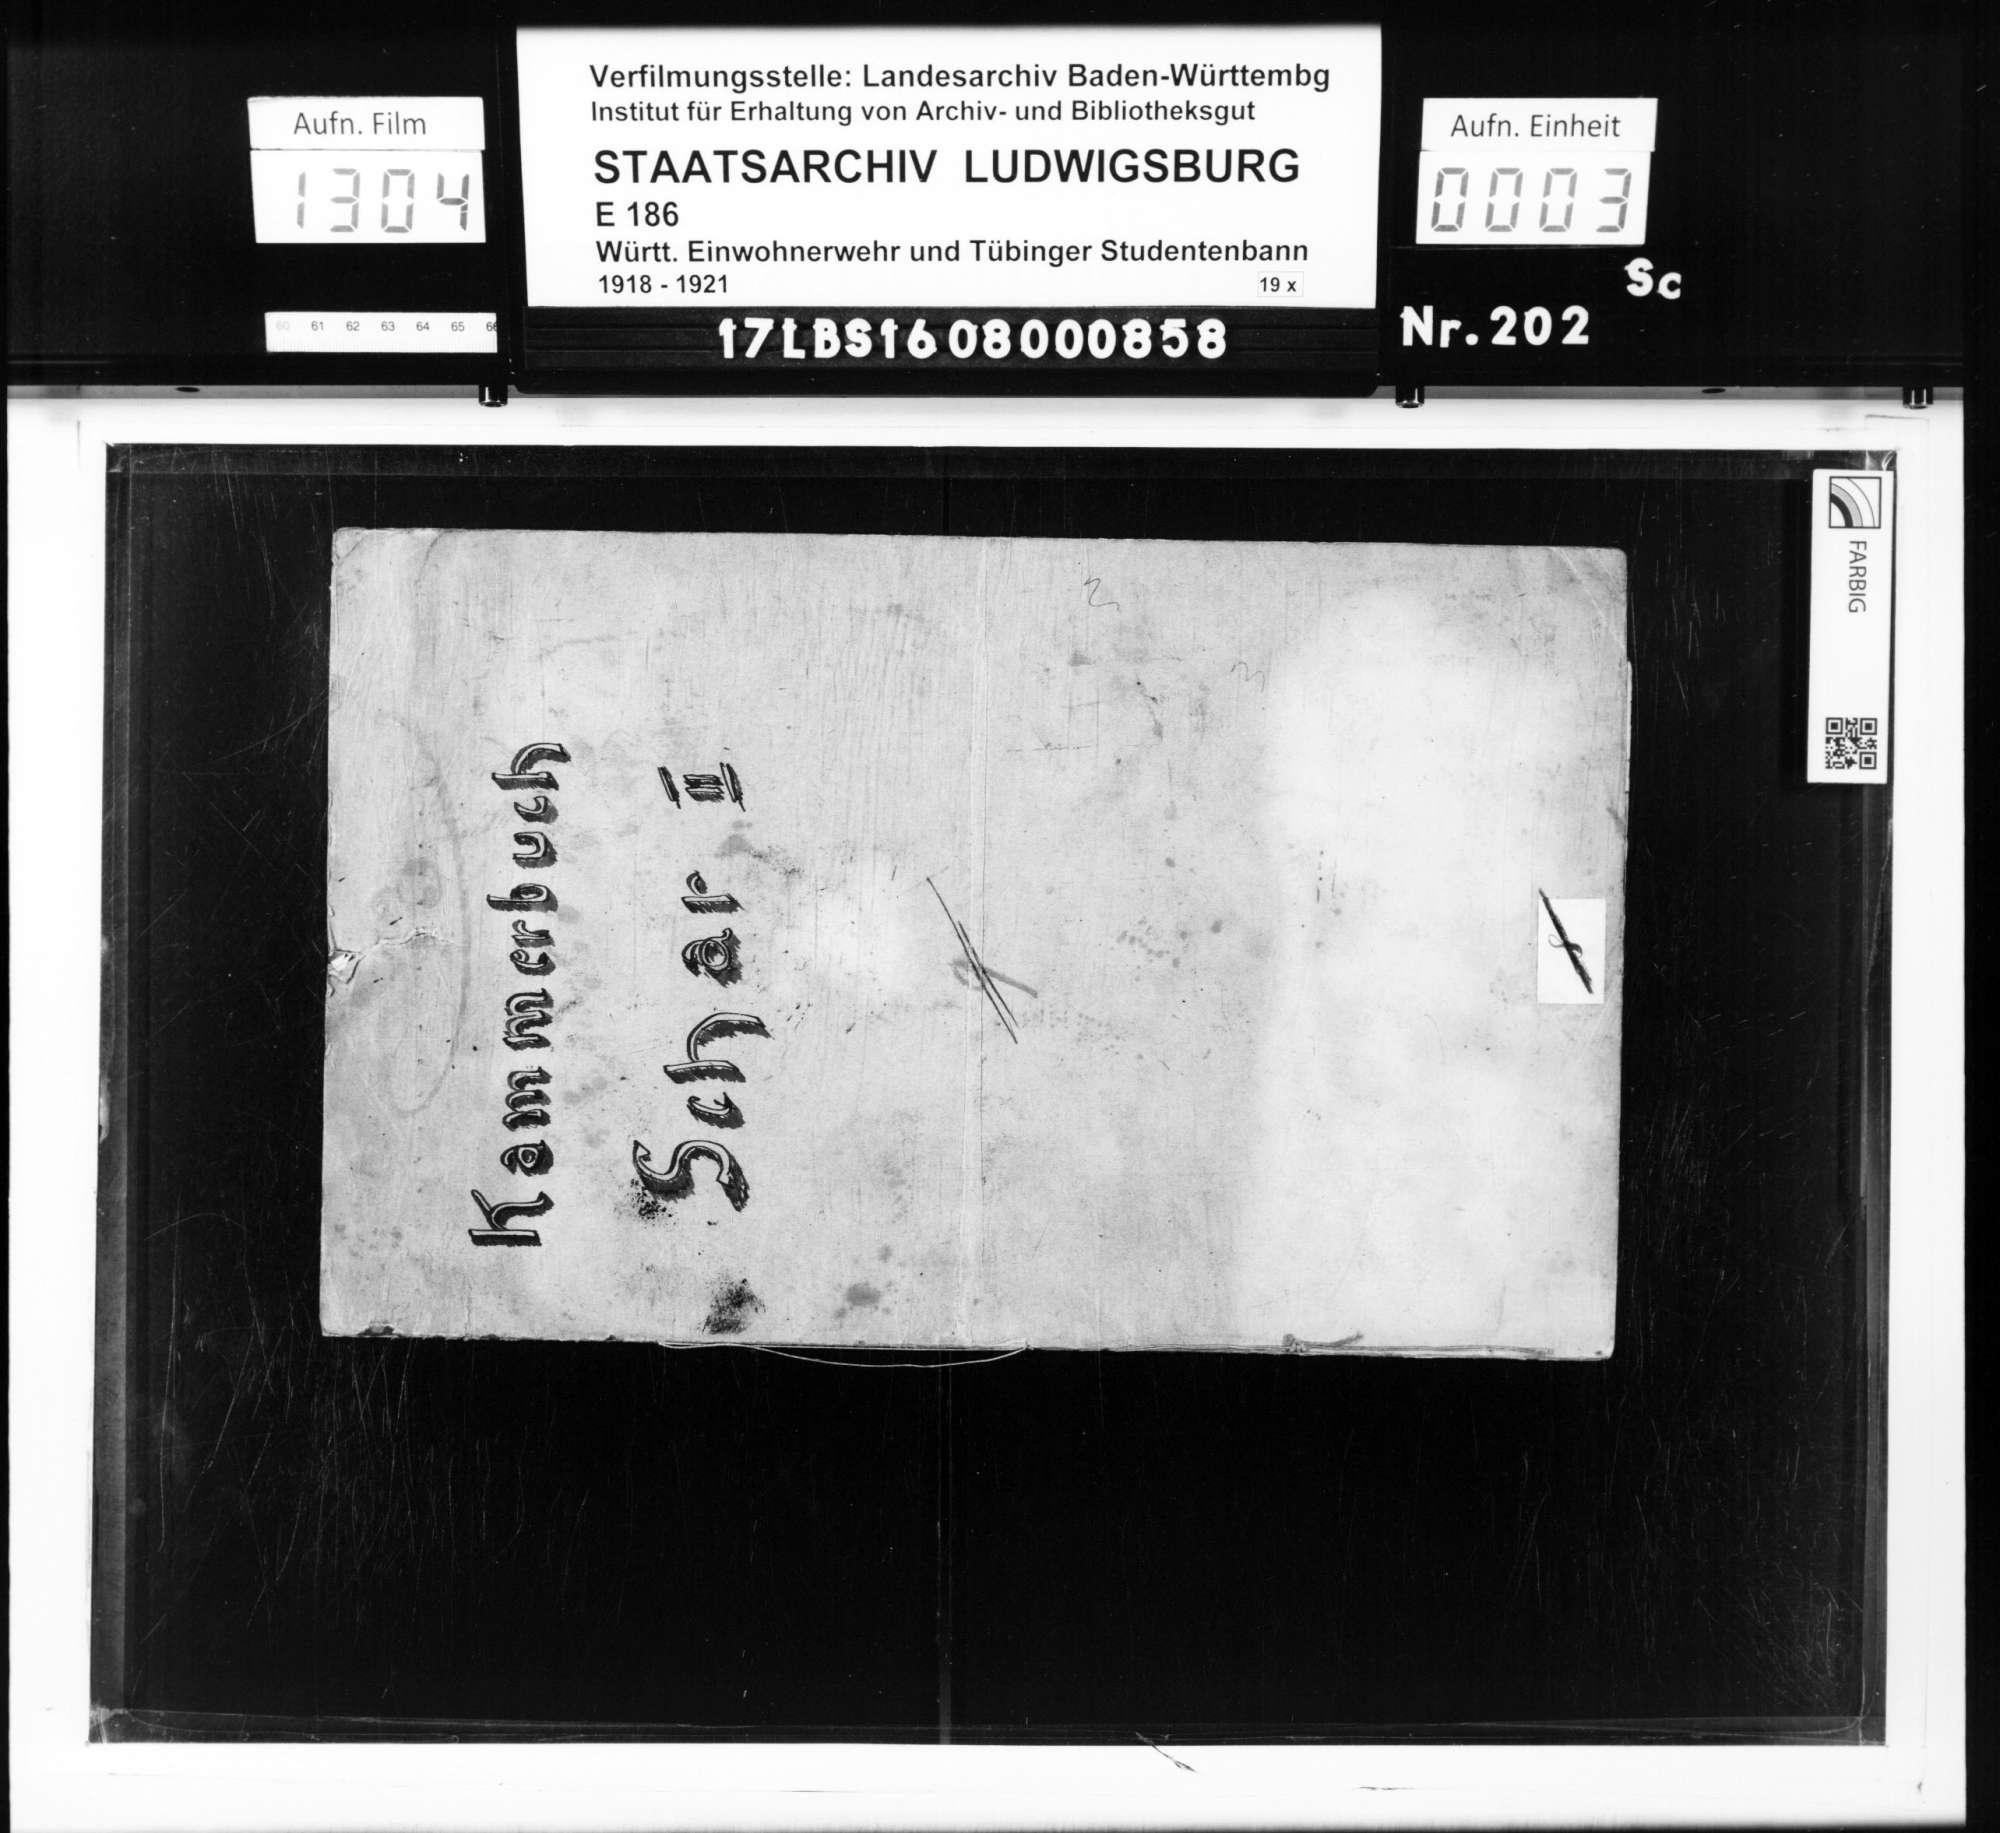 Bann 7/Schar 2 (Birkenwald): Kammerbuch, Bild 1